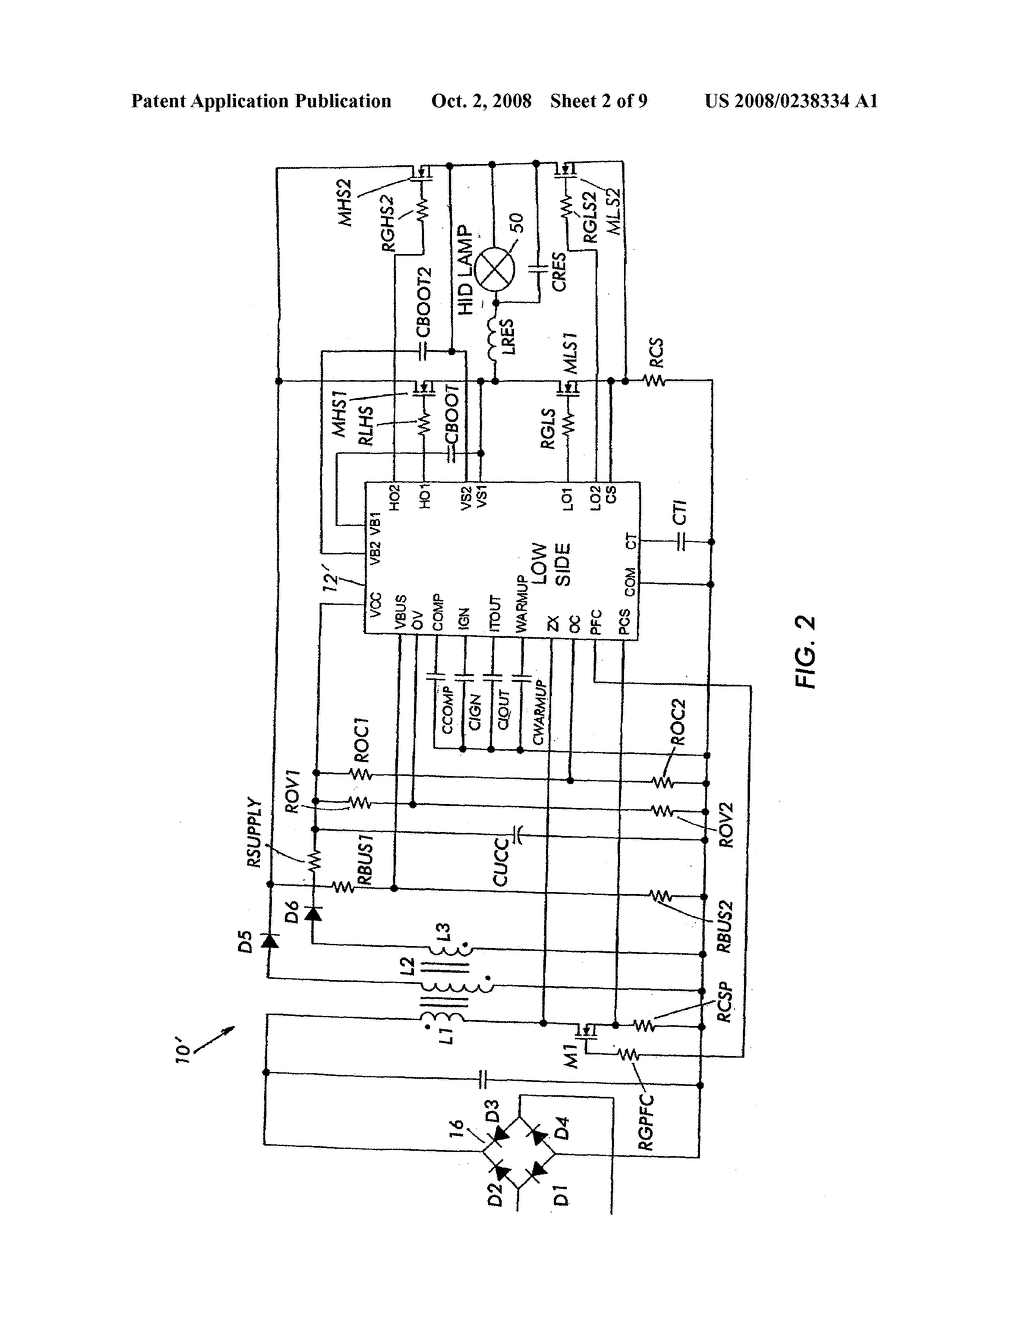 Hid Ballast Circuit Diagram Simple Wiring Options Using Incandescent And Capacitor Ledandlightcircuit Lamp Schematic Image 03 Metal Halide Light